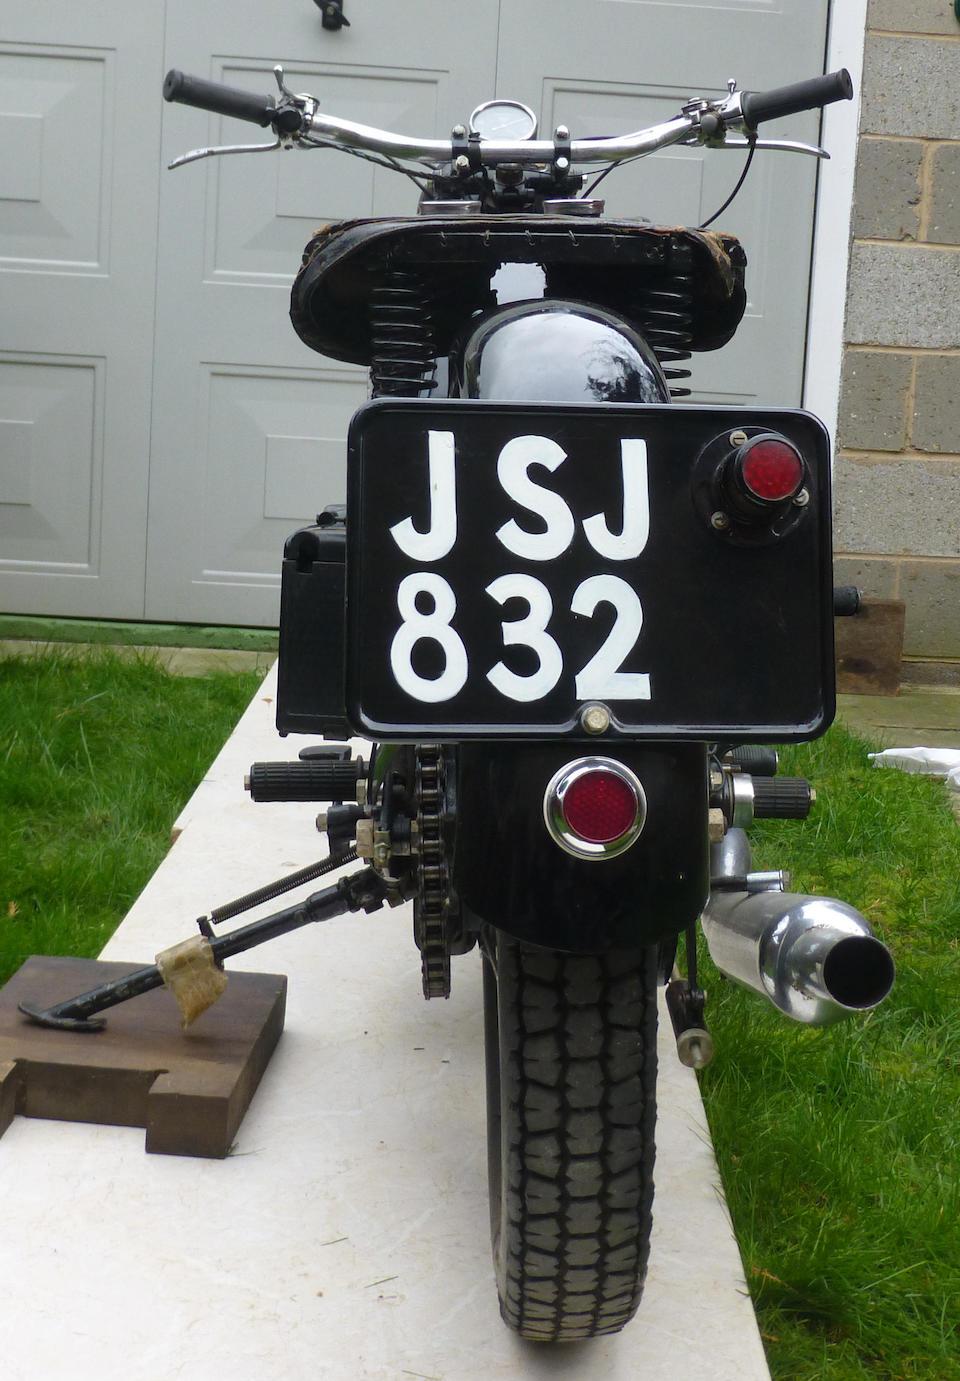 1937 Scott 596cc Flying Squirrel  Frame no. 4421M Engine no. DPY4387